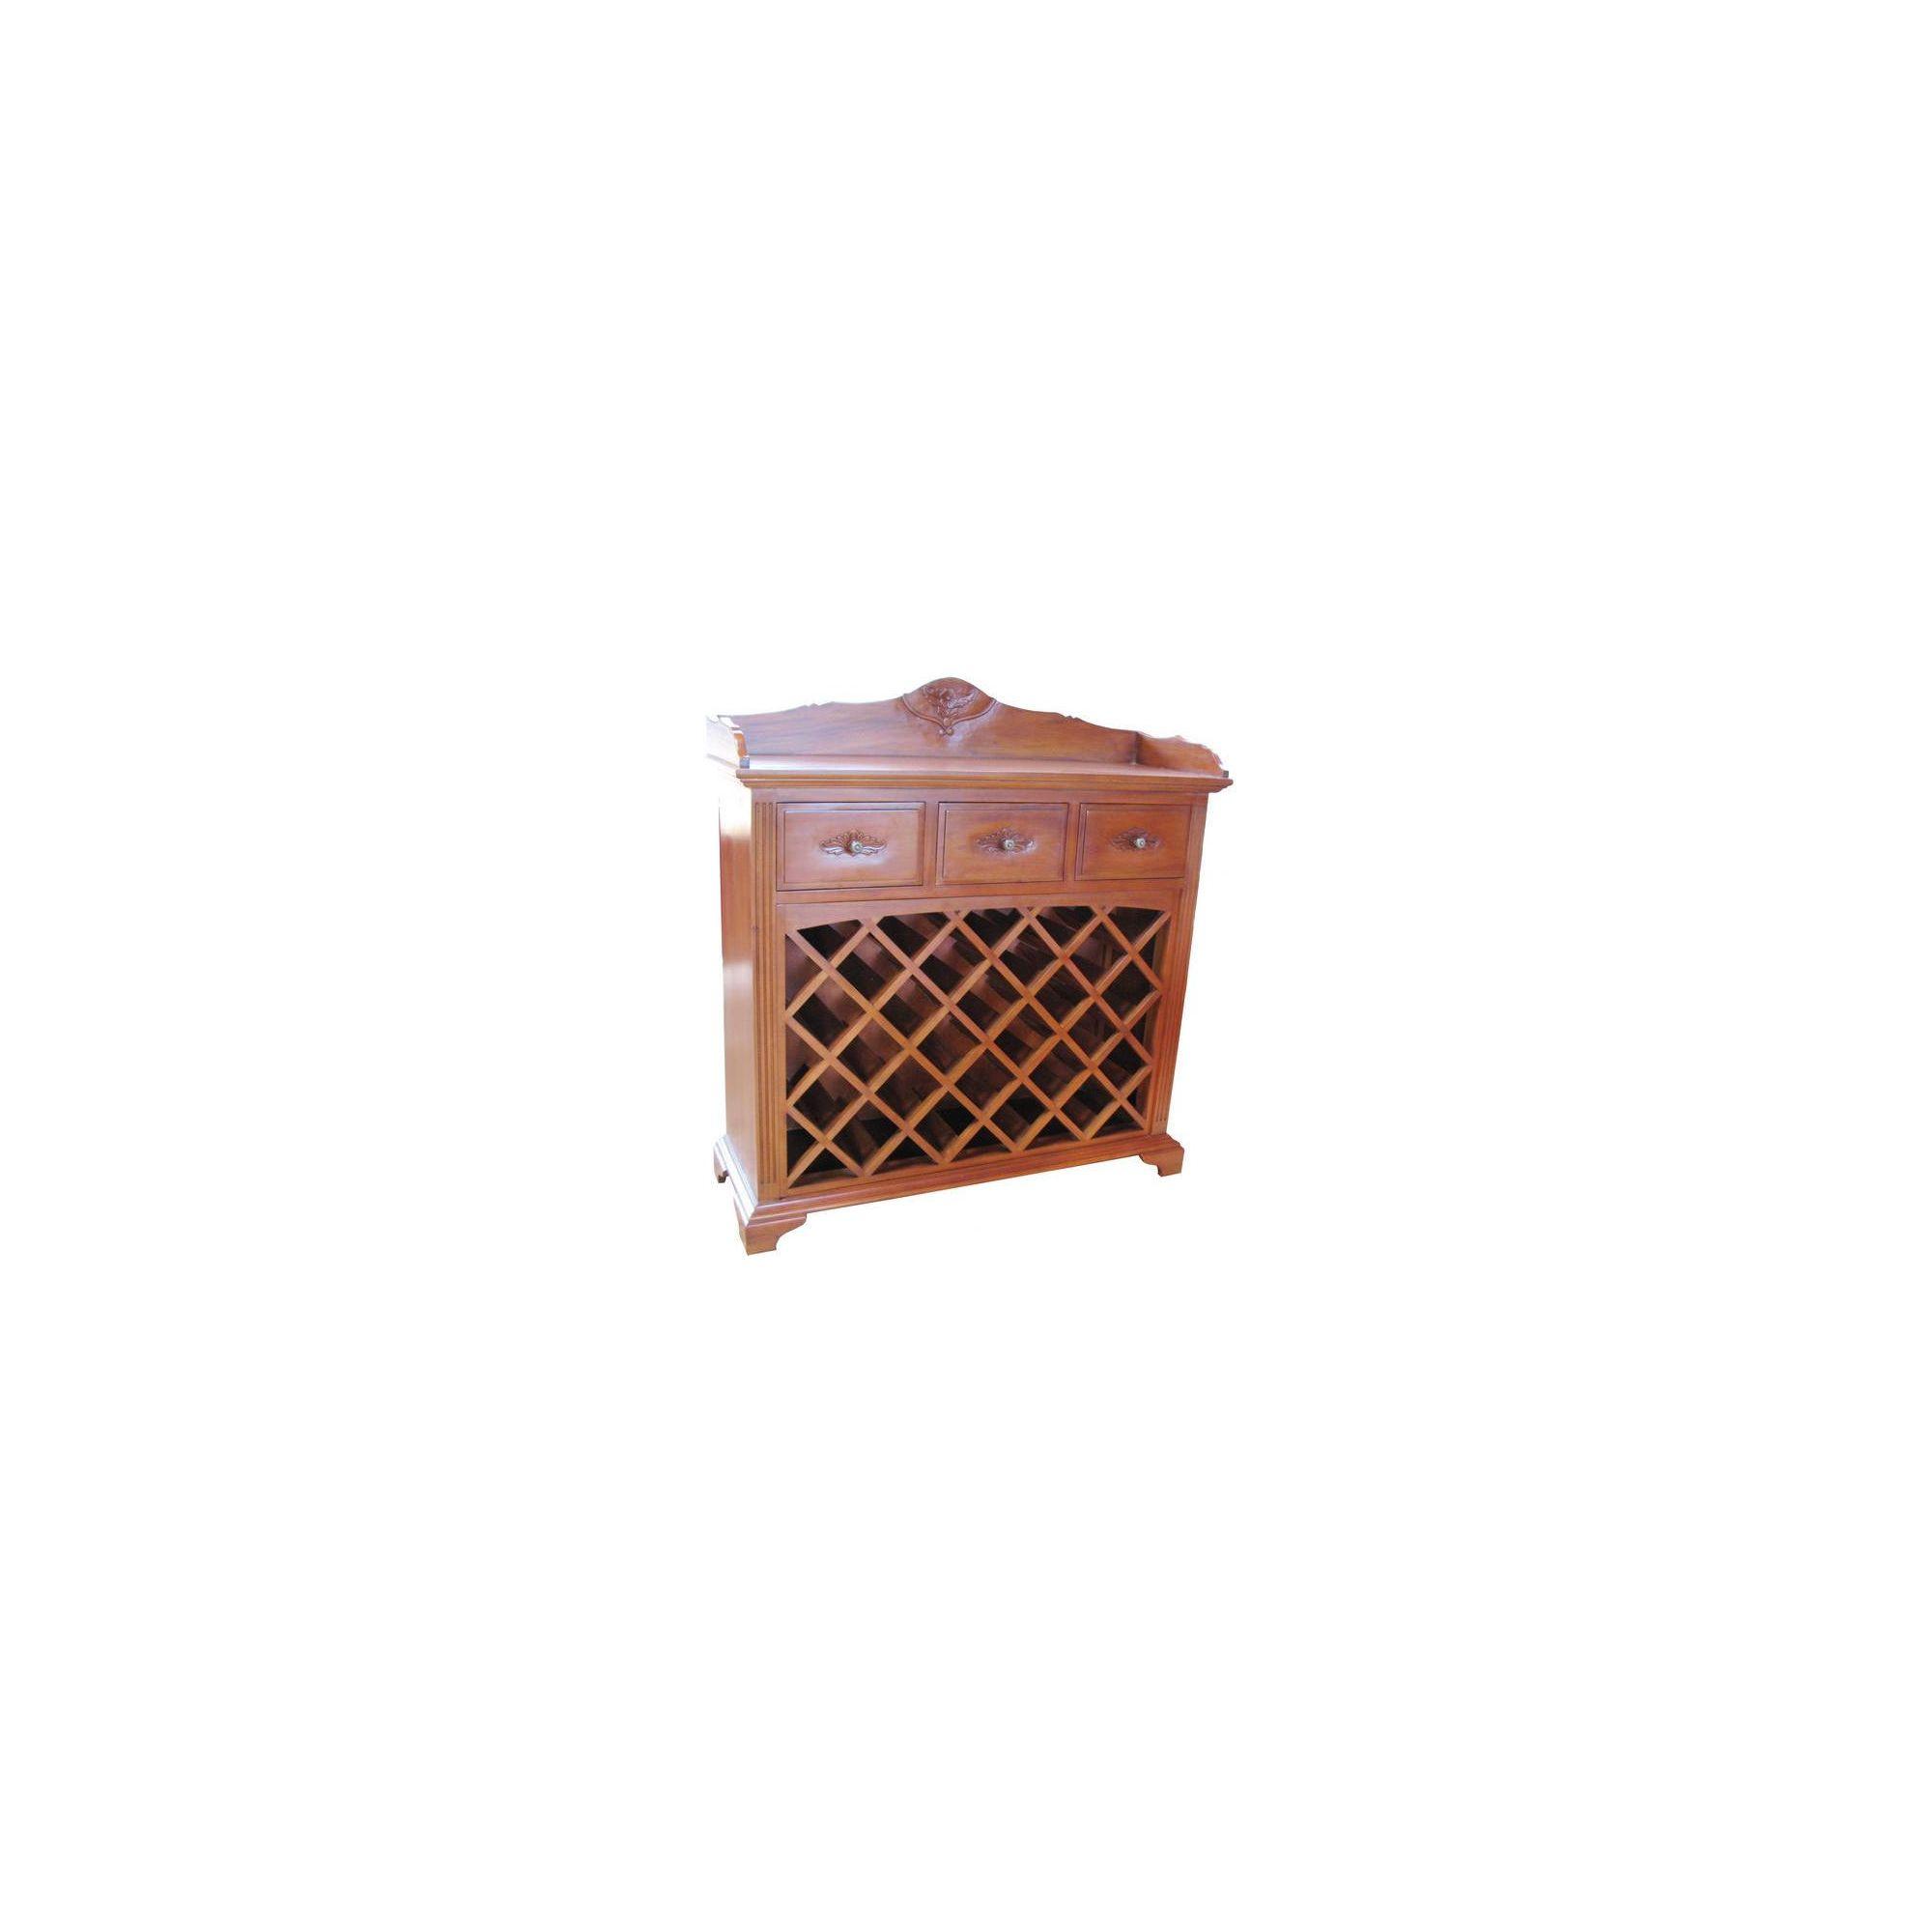 Lock stock and barrel Mahogany 3 Drawer Wine Rack in Mahogany at Tesco Direct